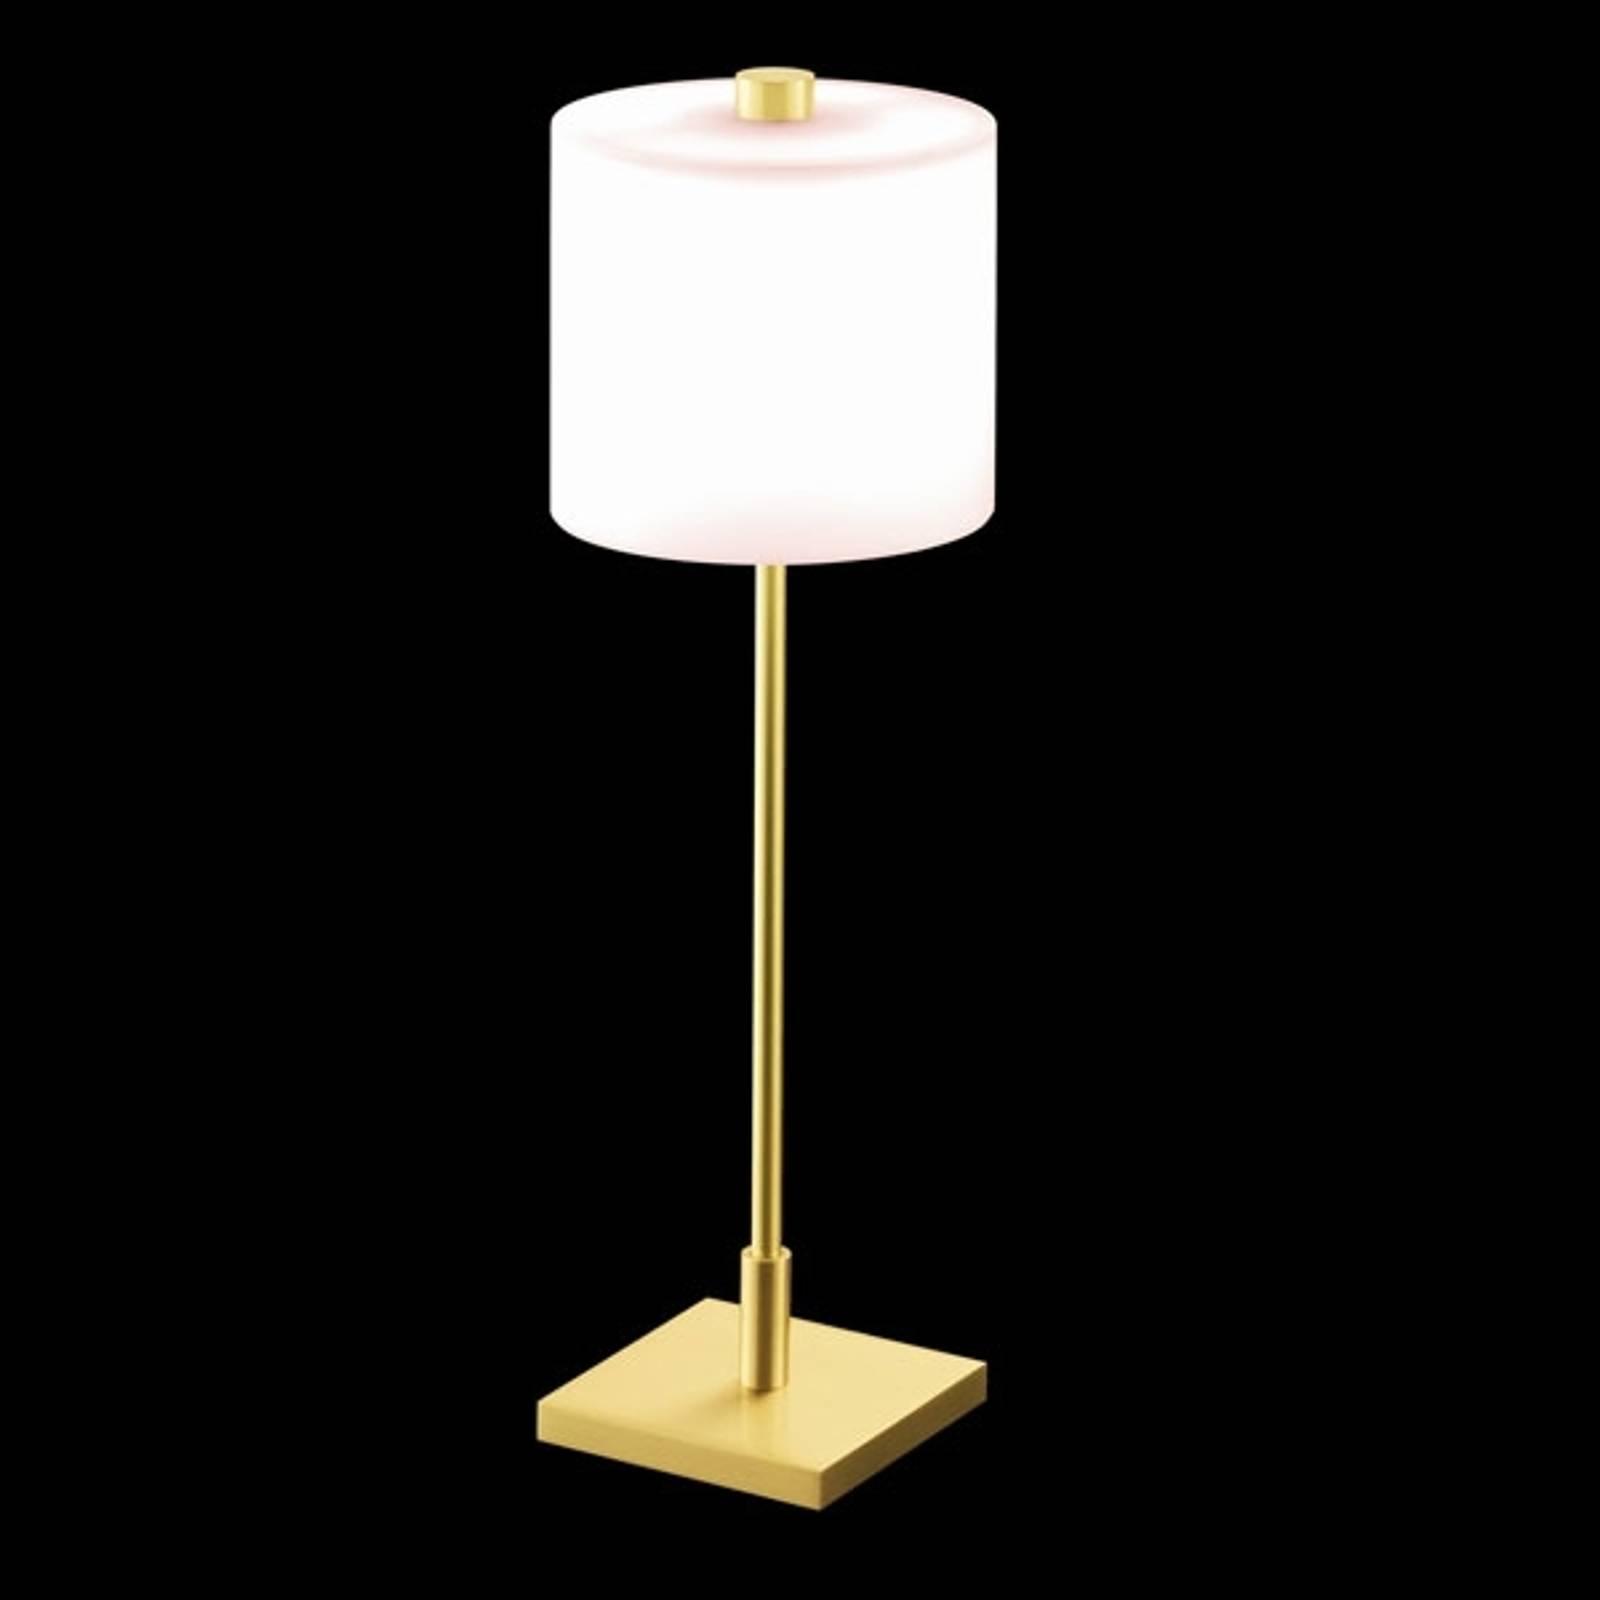 Lampe à poser KNAPSTEIN MERCY laiton mat